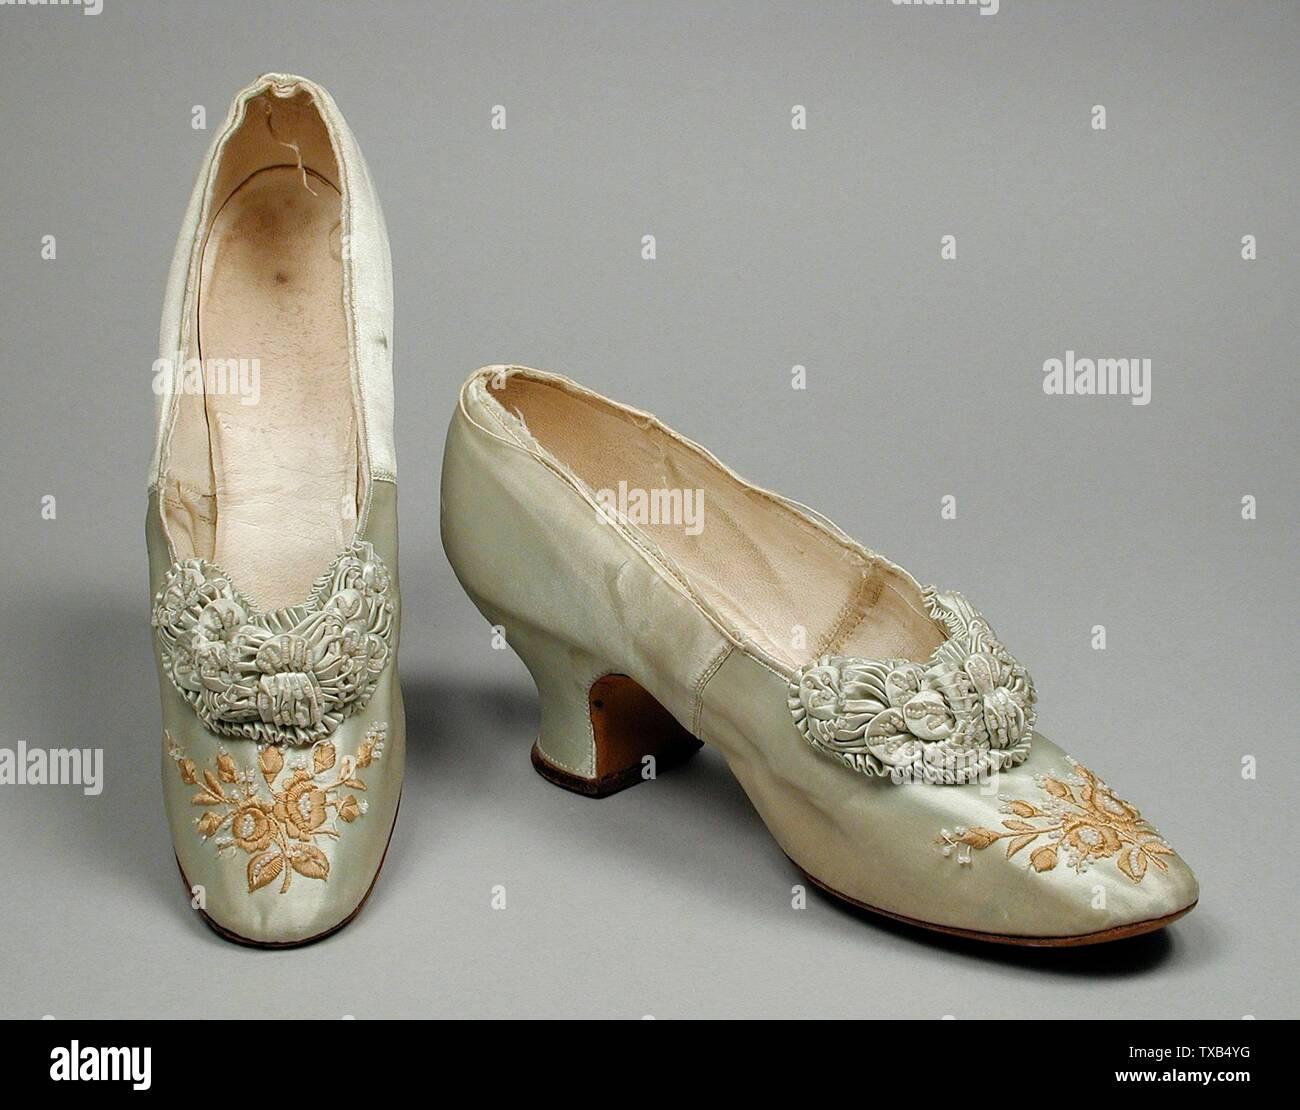 CHM QS Ladies Edwardian Era Shoes